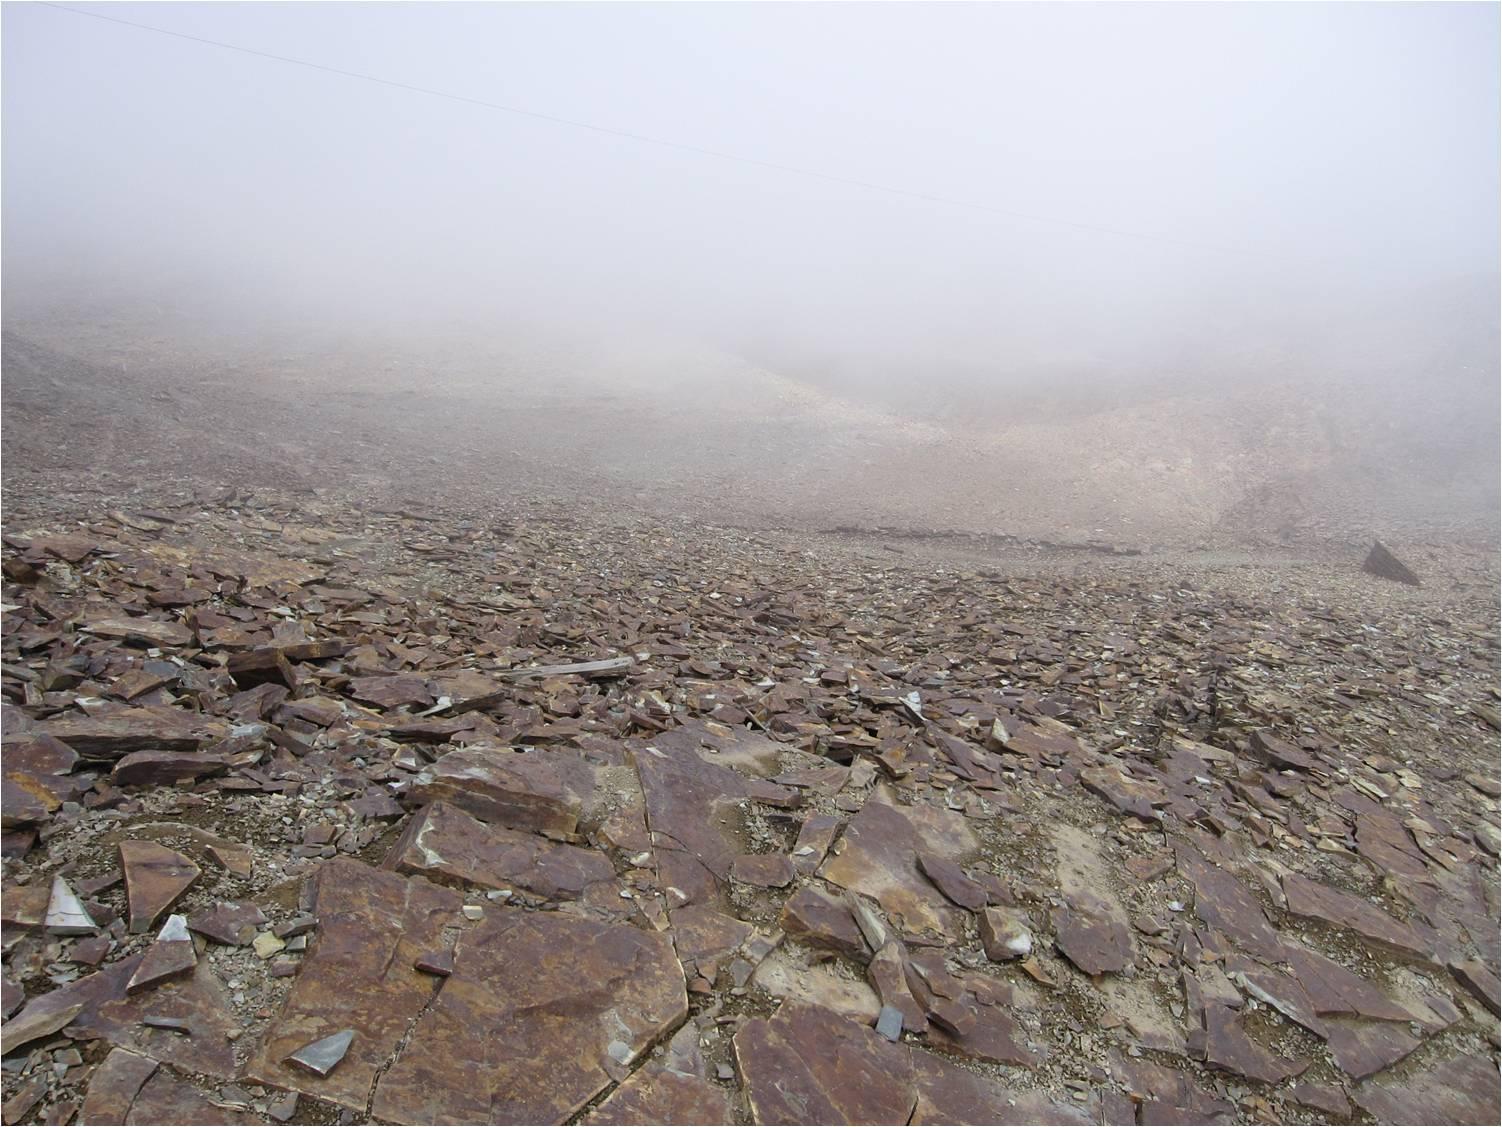 http://cambioclimatico.terra-justa.org/p315